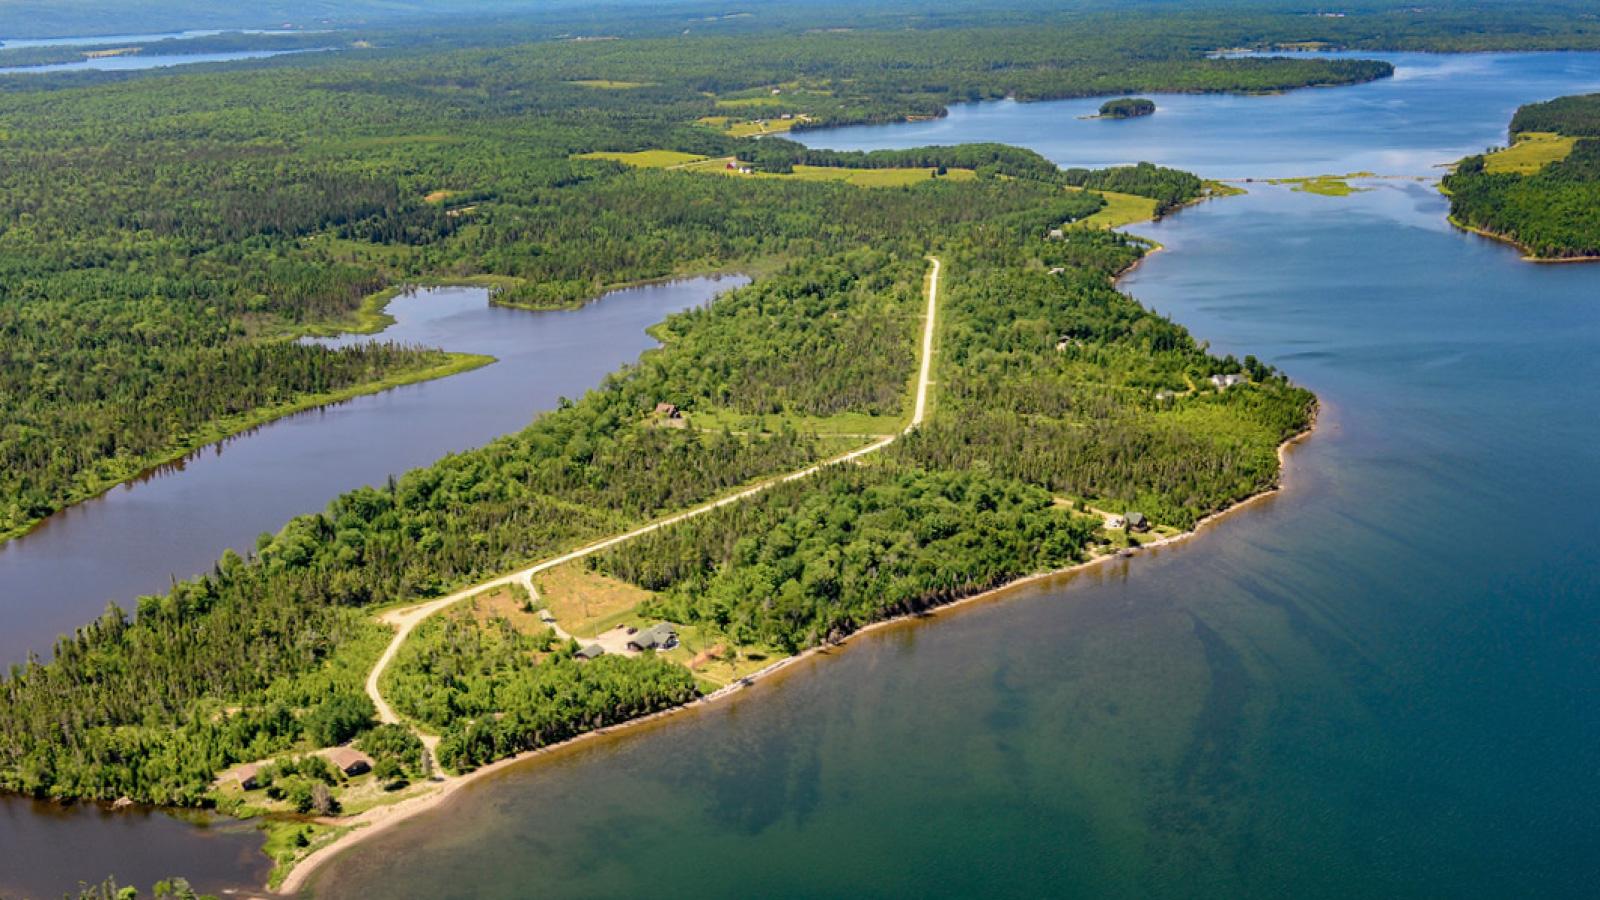 Canadian Pioneer Estates Ltd. Erschließung in 1998, 55 Lots